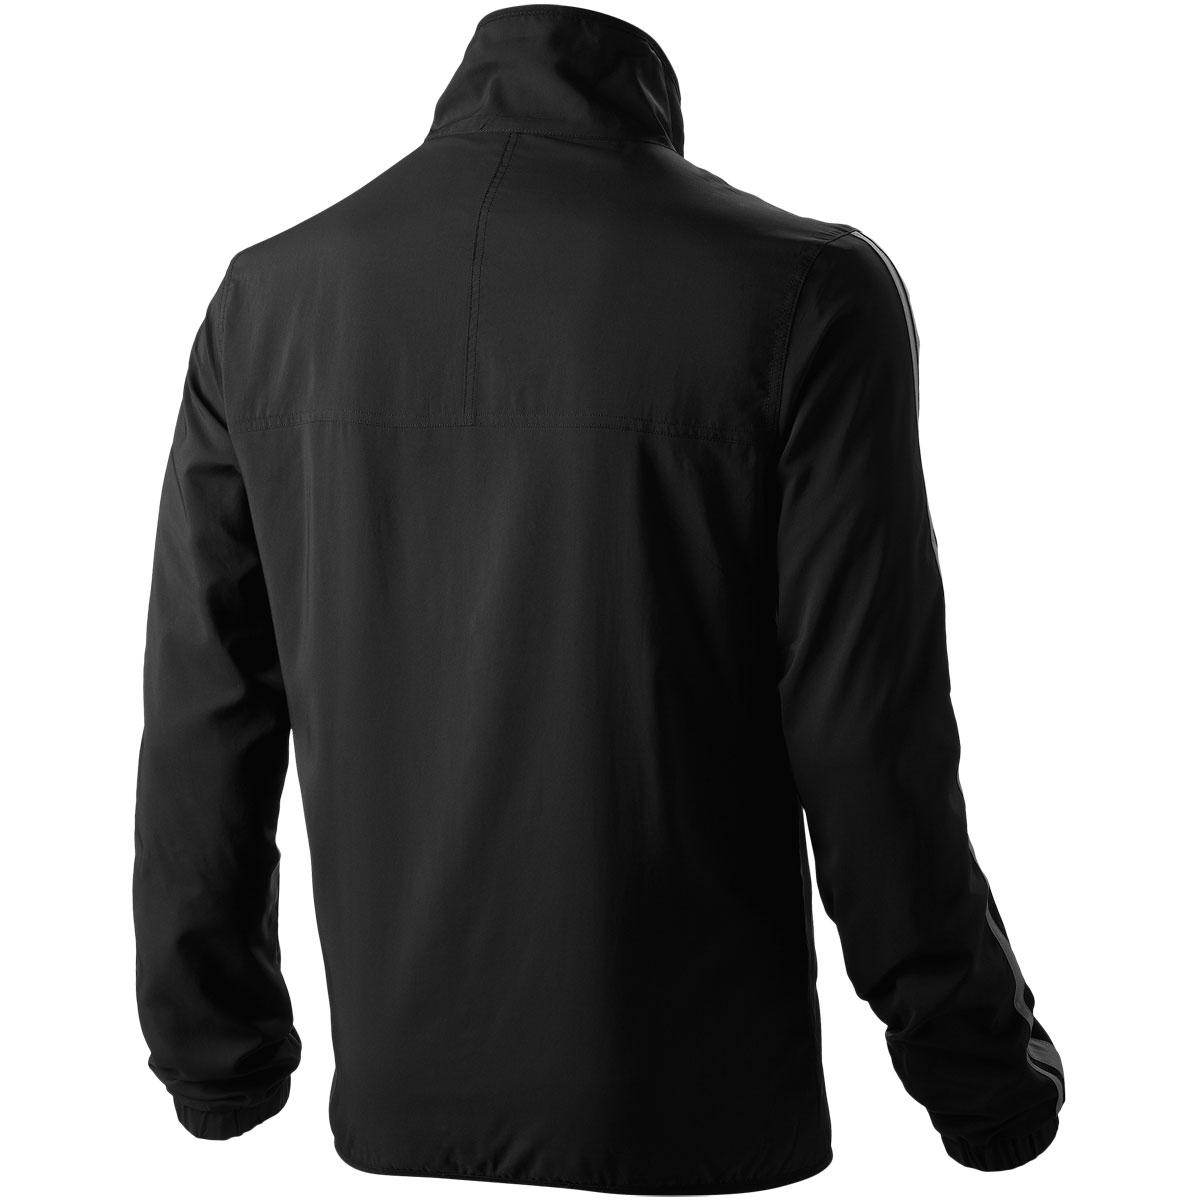 Мужская ветровка Asics Woven Track Jacket черная  (113154 0904) фото